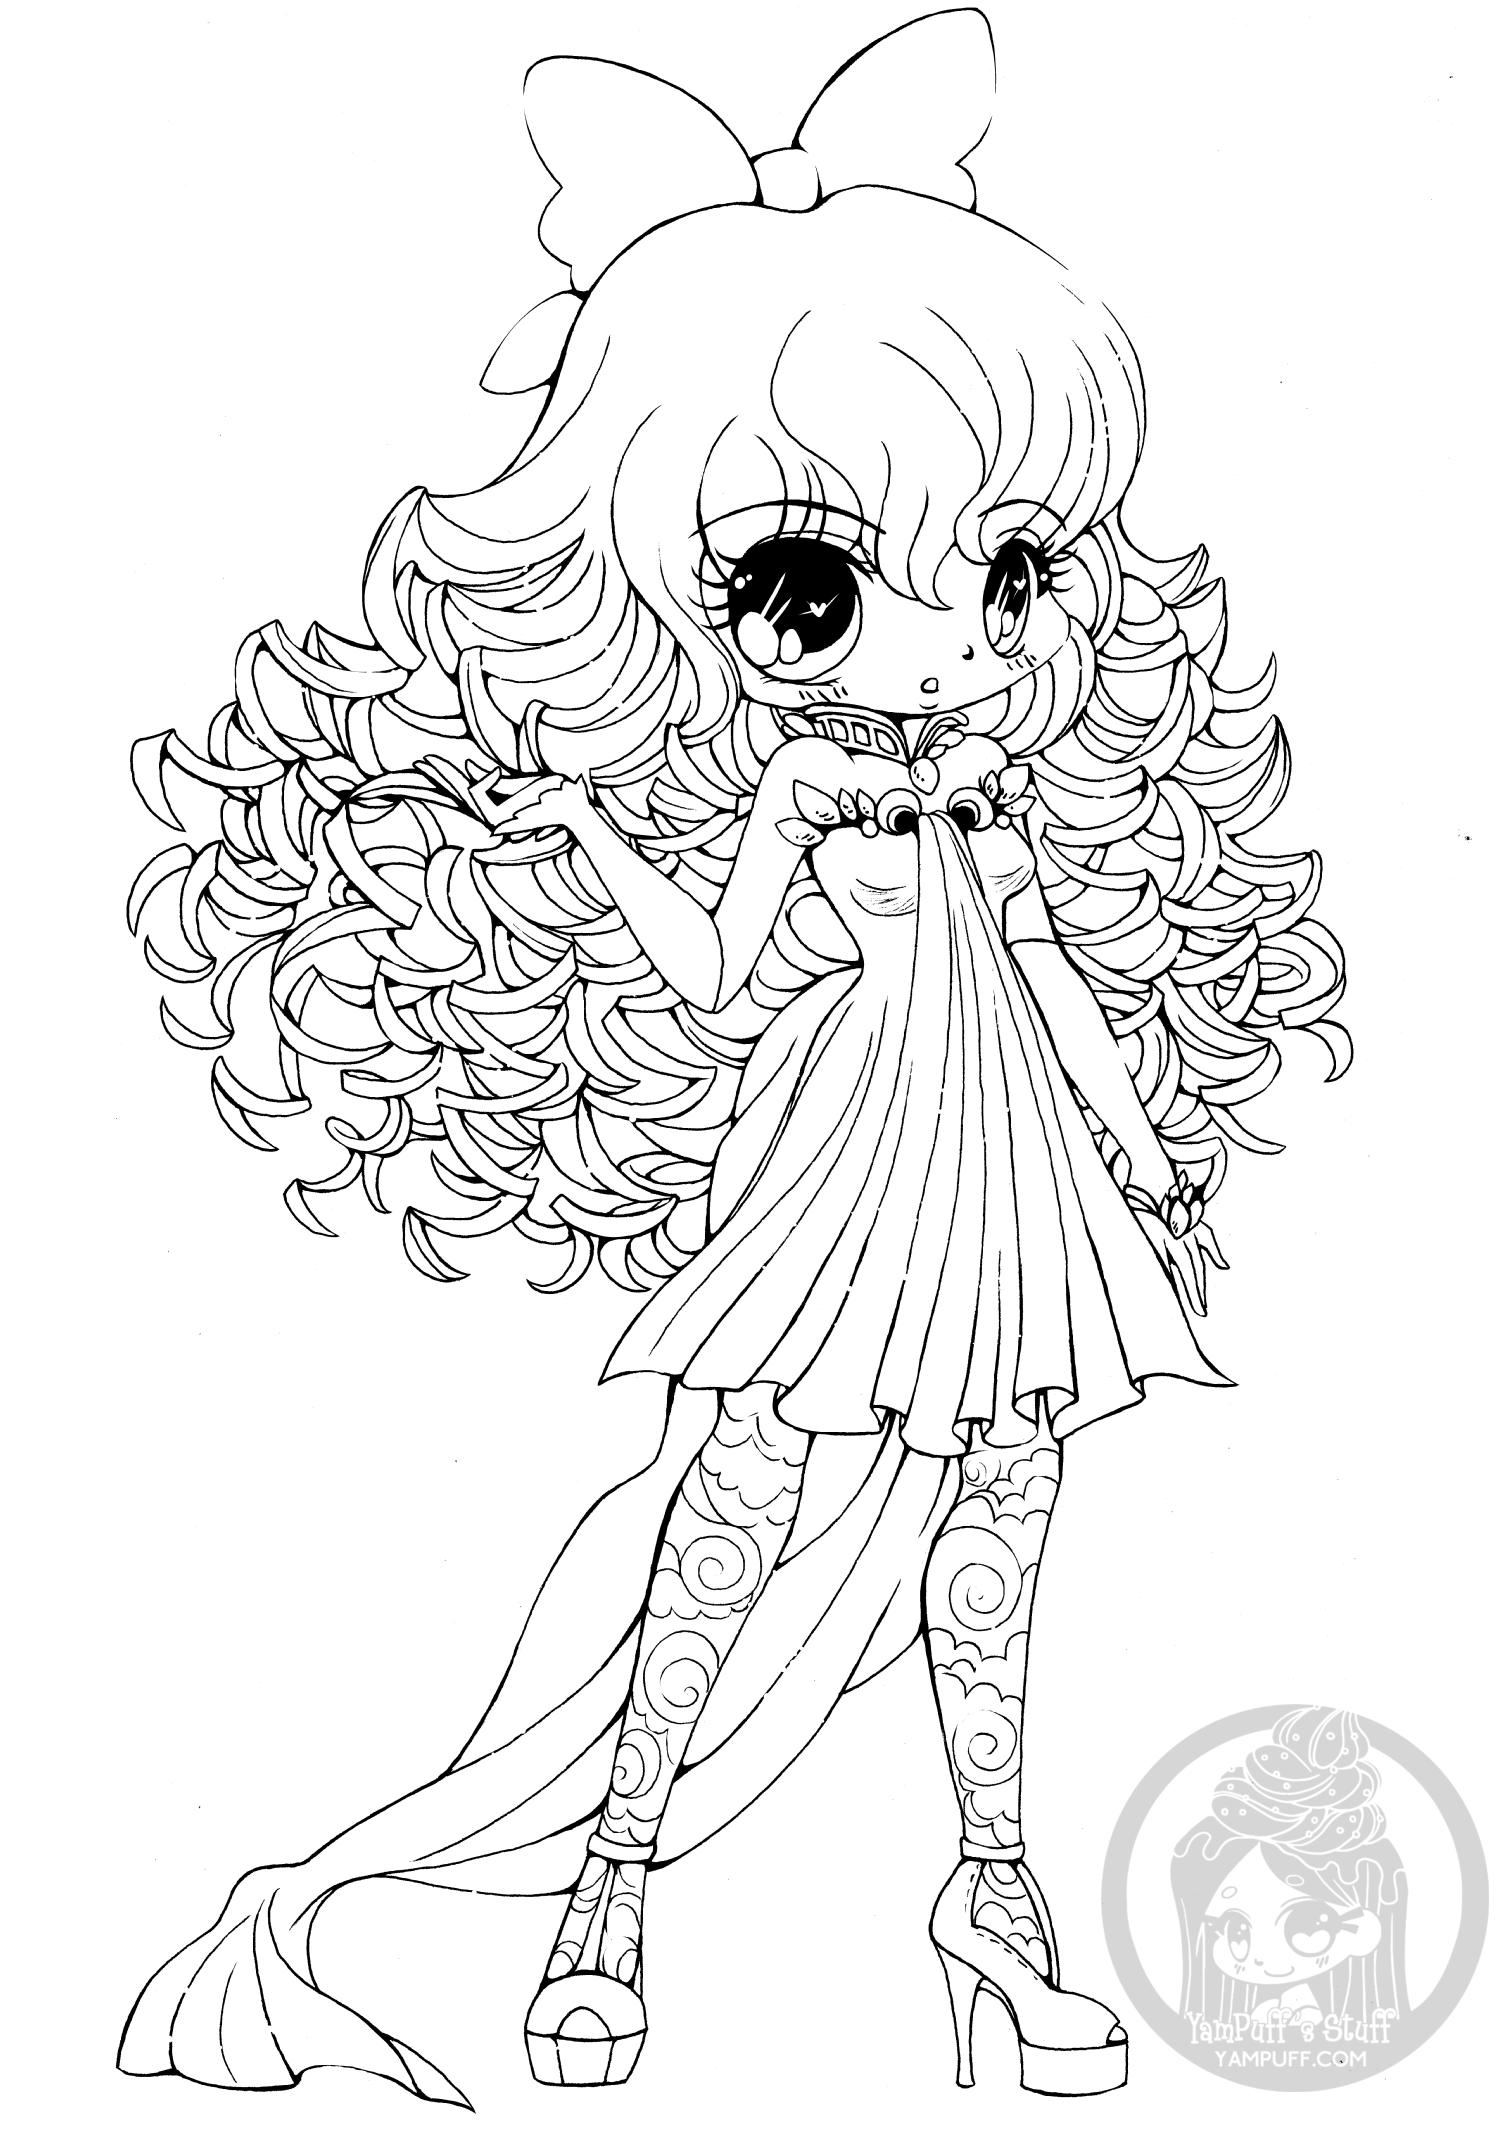 - Curly Haired Girl Chibi Lineart By YamPuff • YamPuff's Stuff